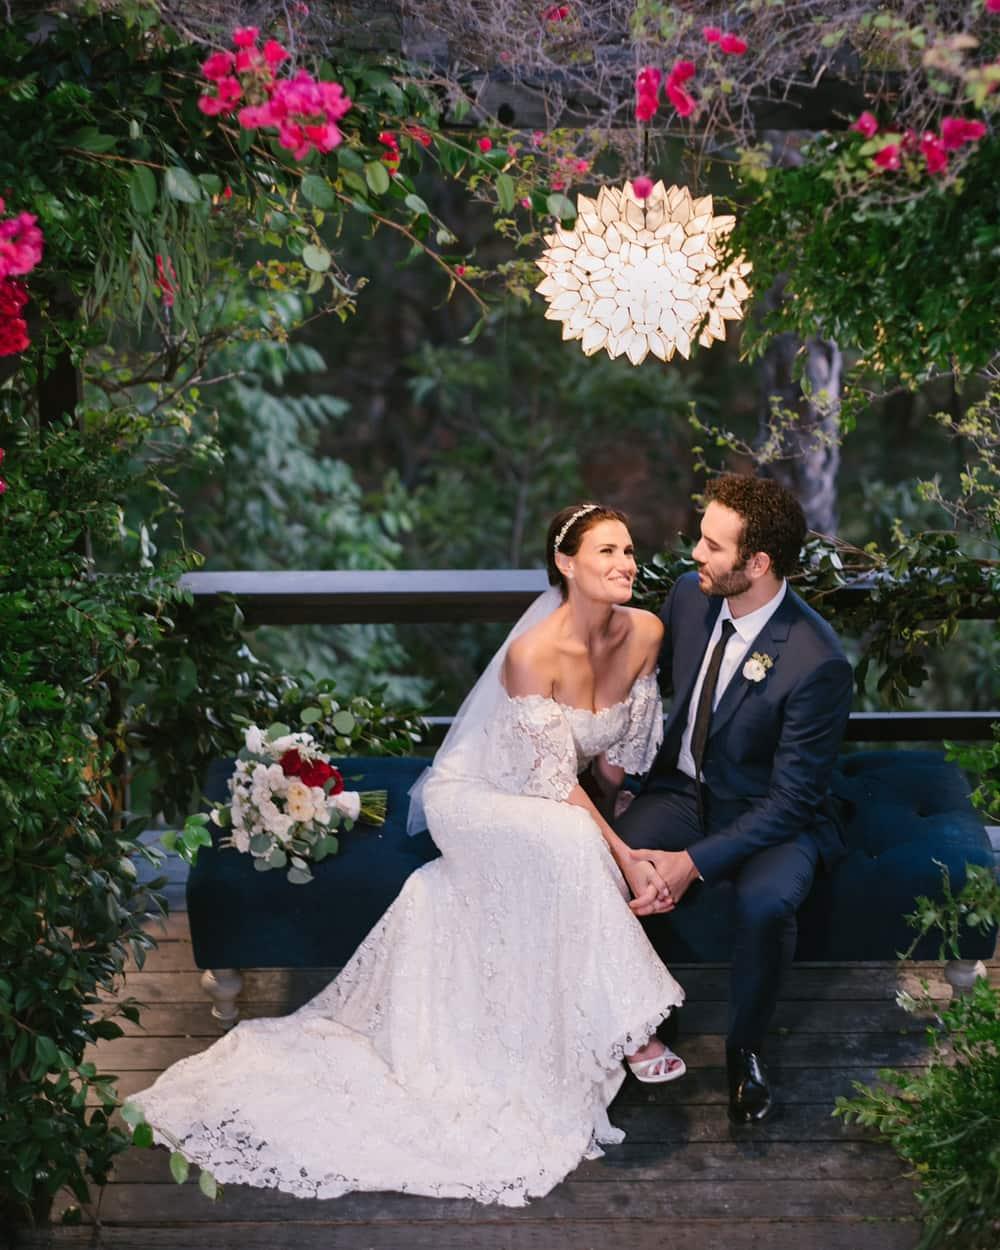 Idina Menzel Menikah Dengan Aaron Lohr